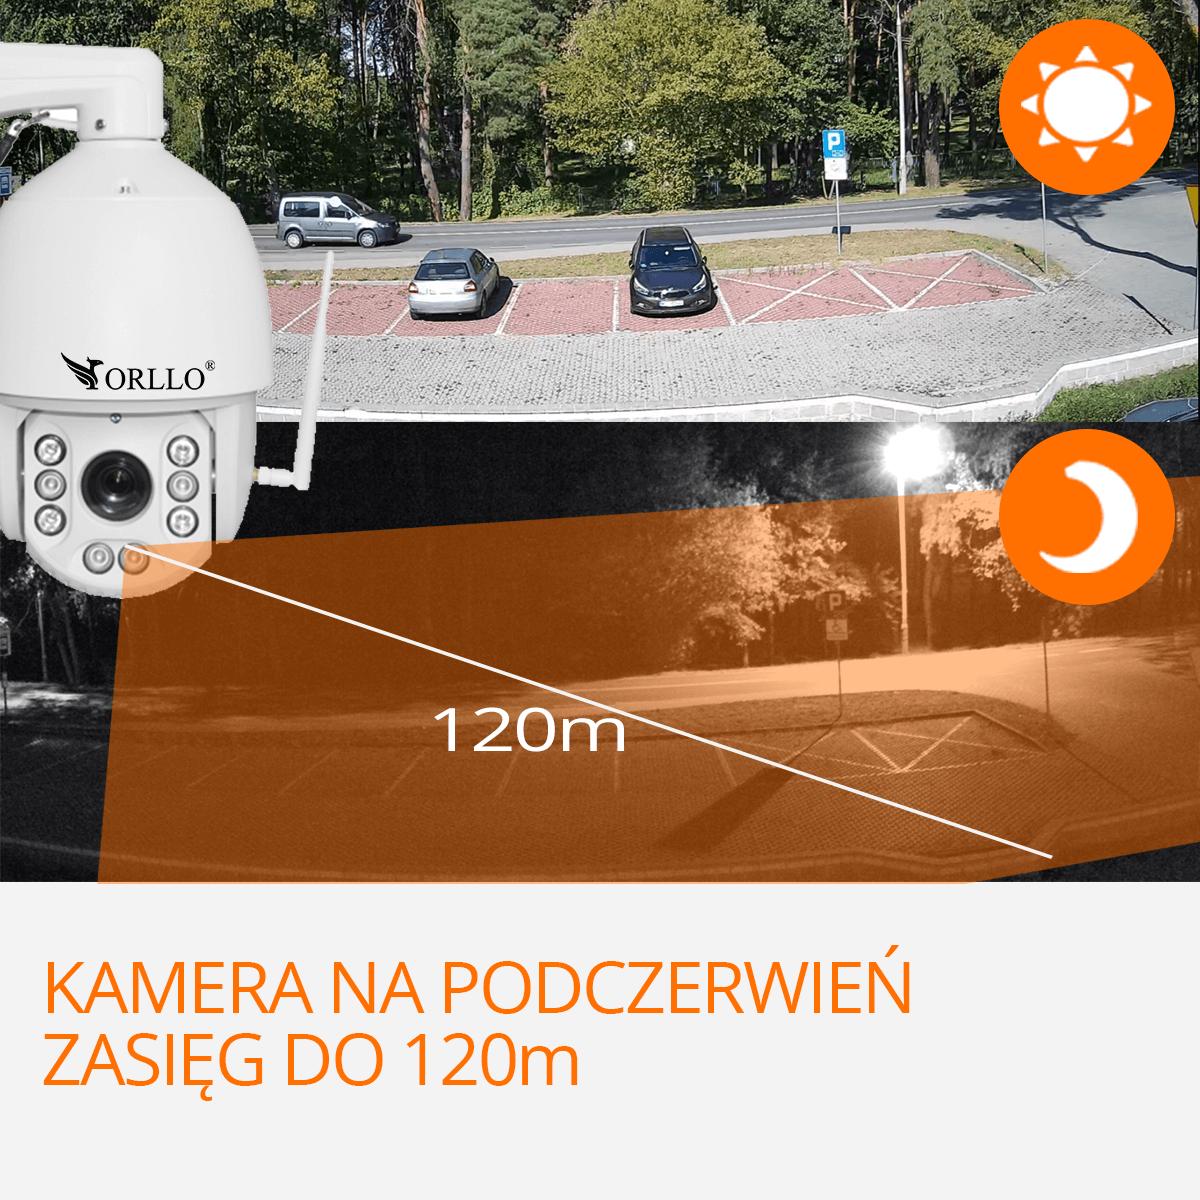 kamera przetwornik sony starvis full hd 1080p orllo.pl